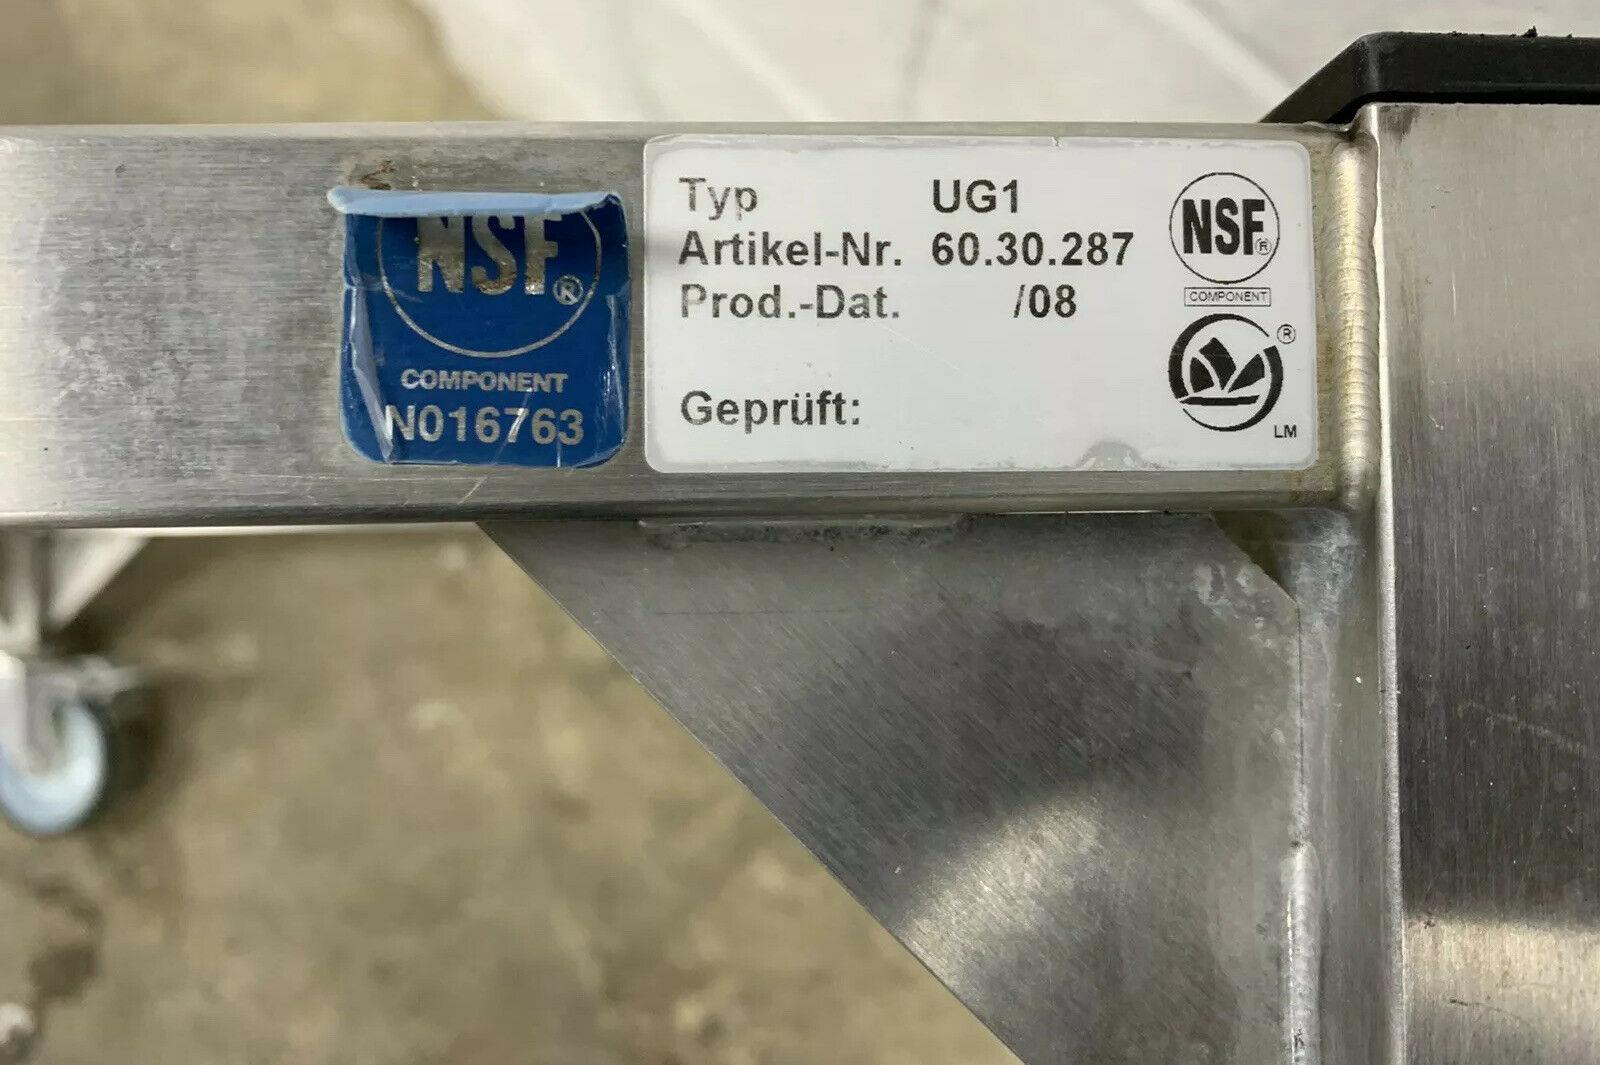 Lot 31 - Rational UG1 Double Stack Oven Trolley